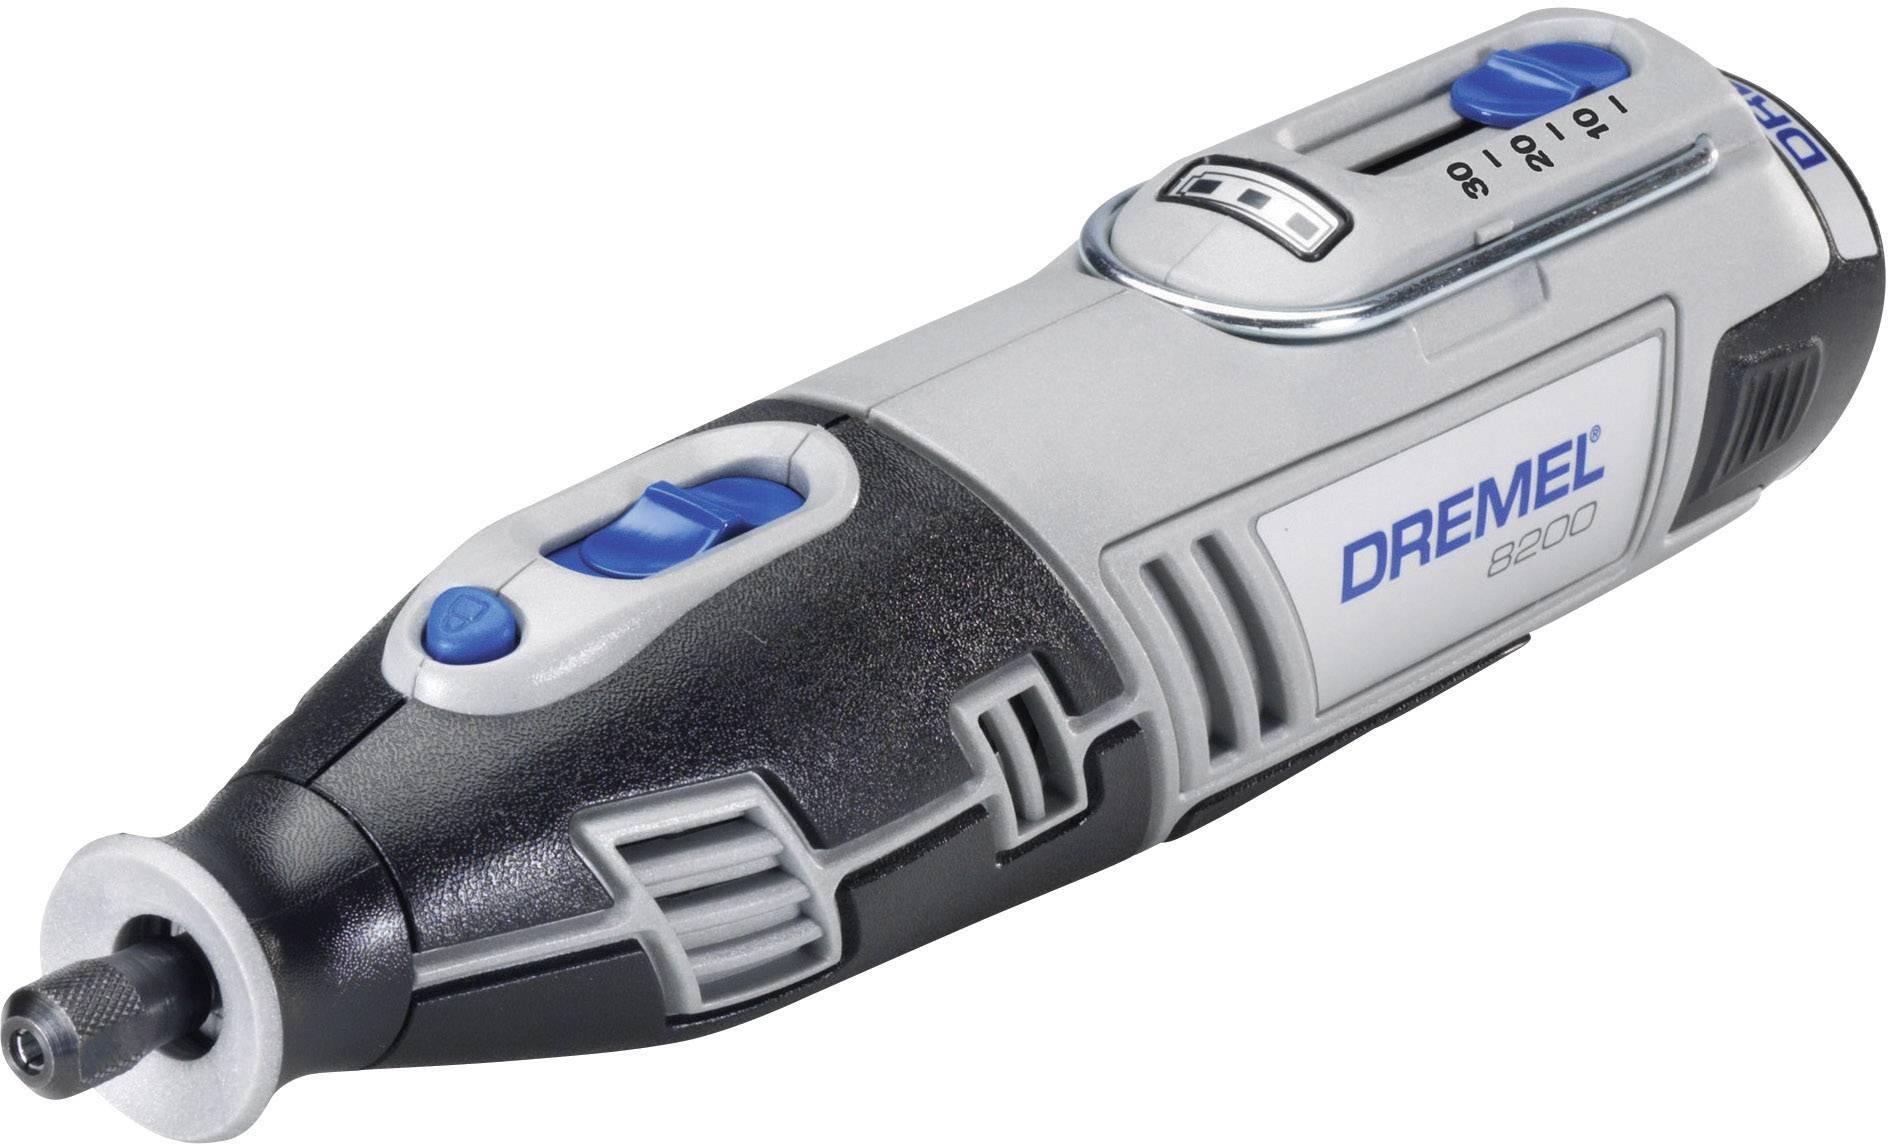 Multifunkčný nástroj Dremel 8200-5/65 Platinum Edition F0138200KN, + 2. akumulátor, vr. príslušenstva